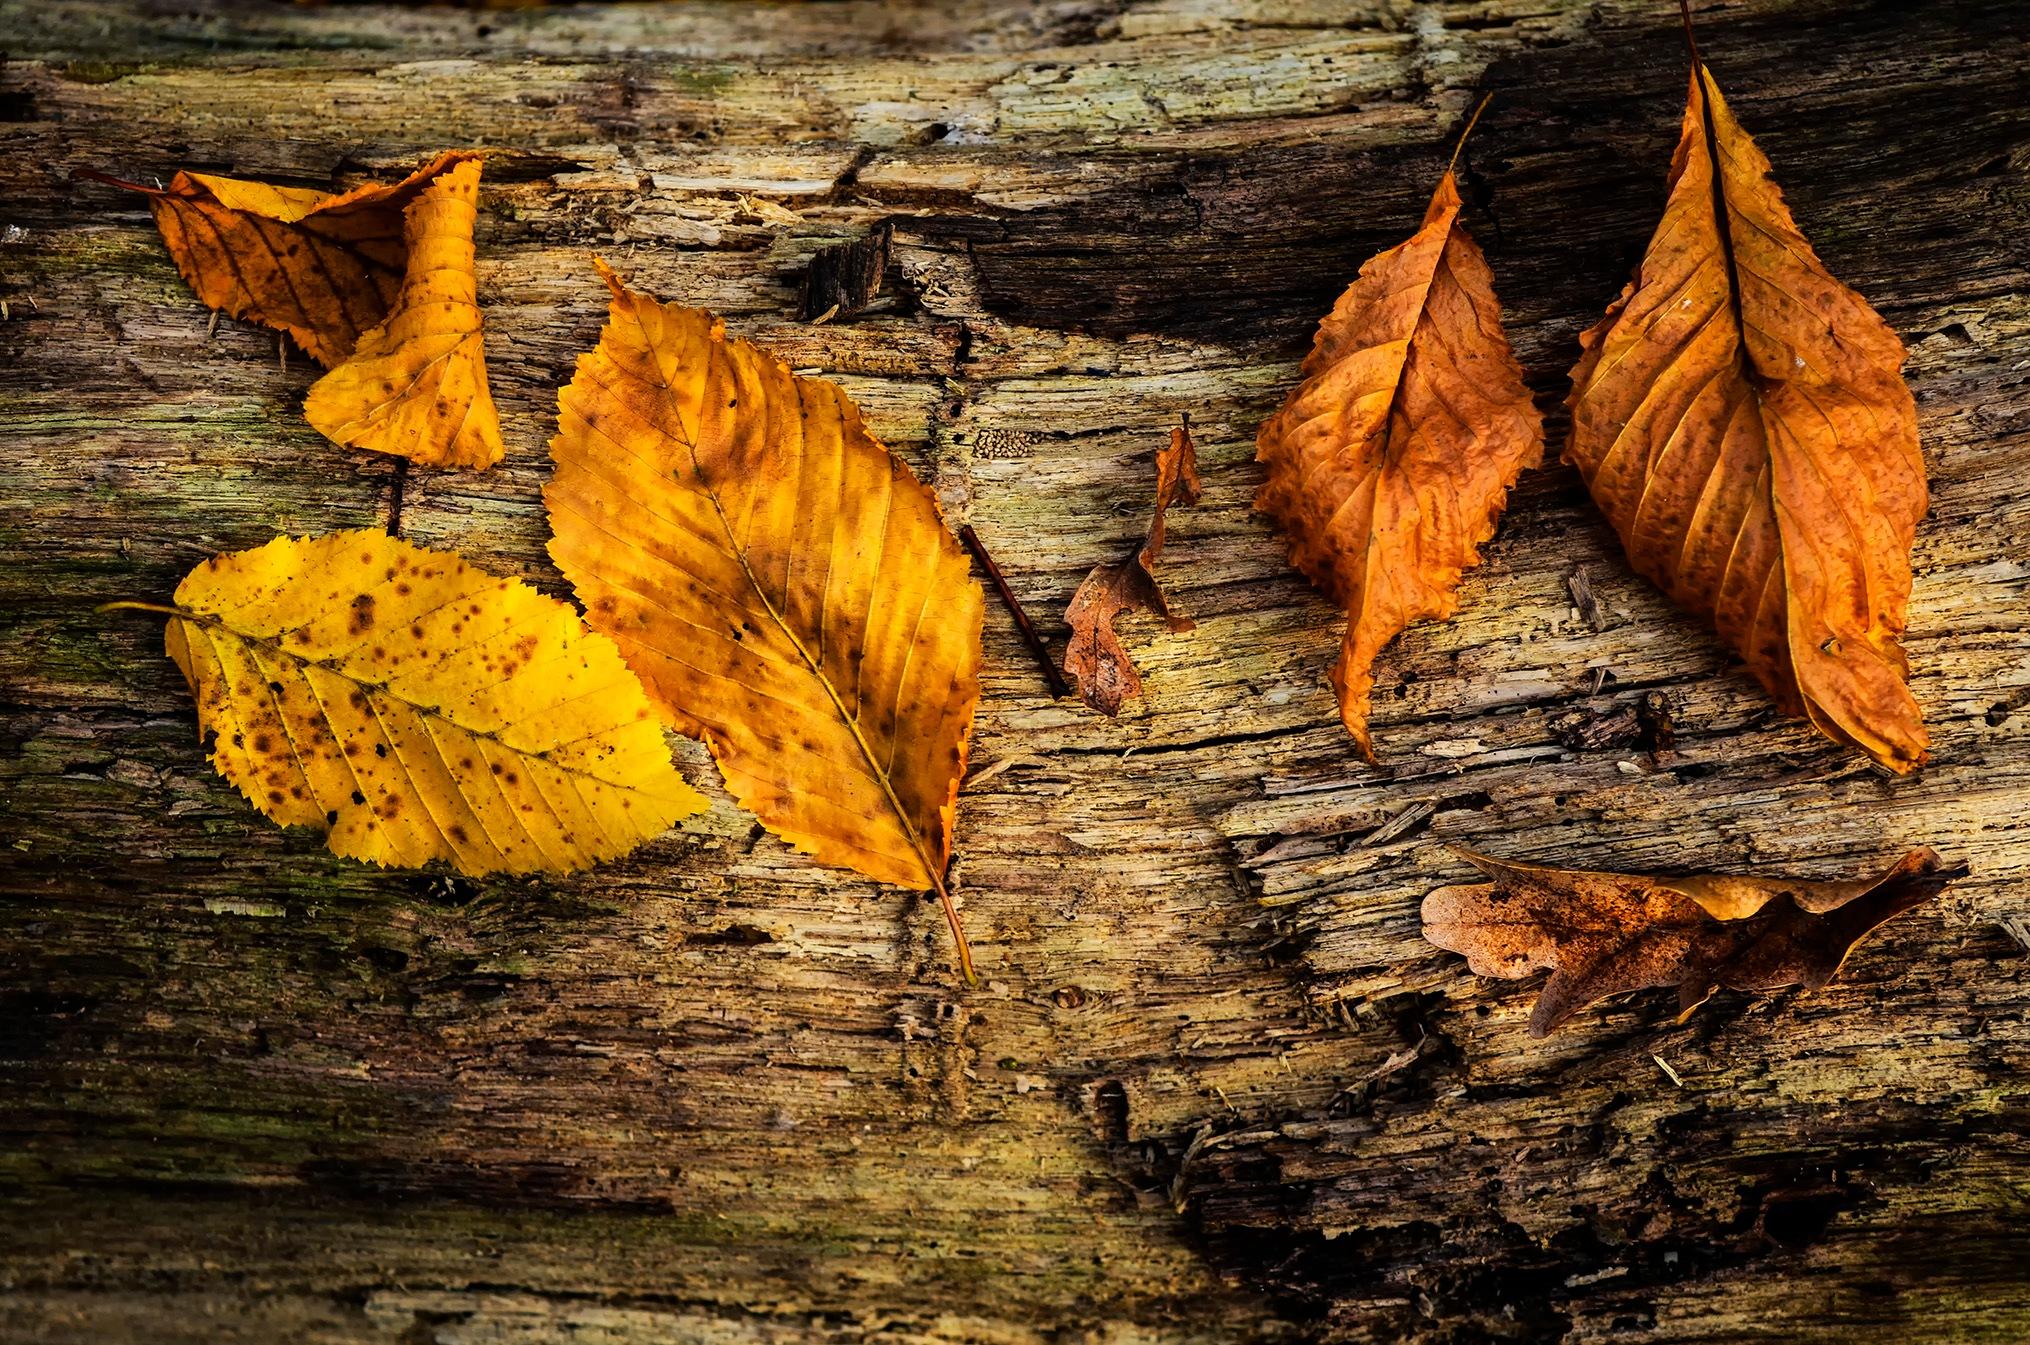 Autumn leaves by Mikaela Dana